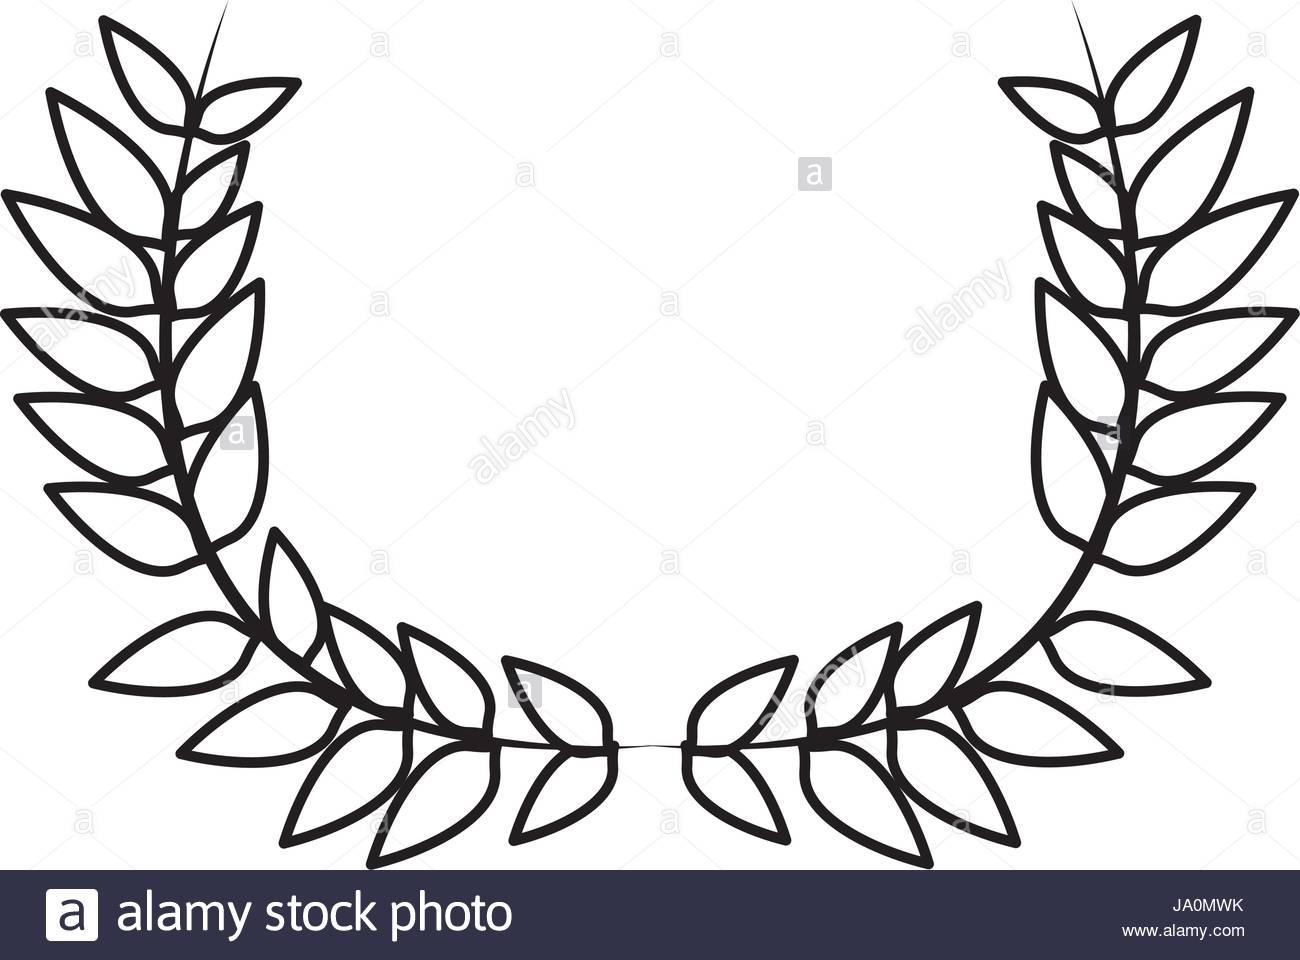 Laurel clipart leaf decoration. Clip art free download